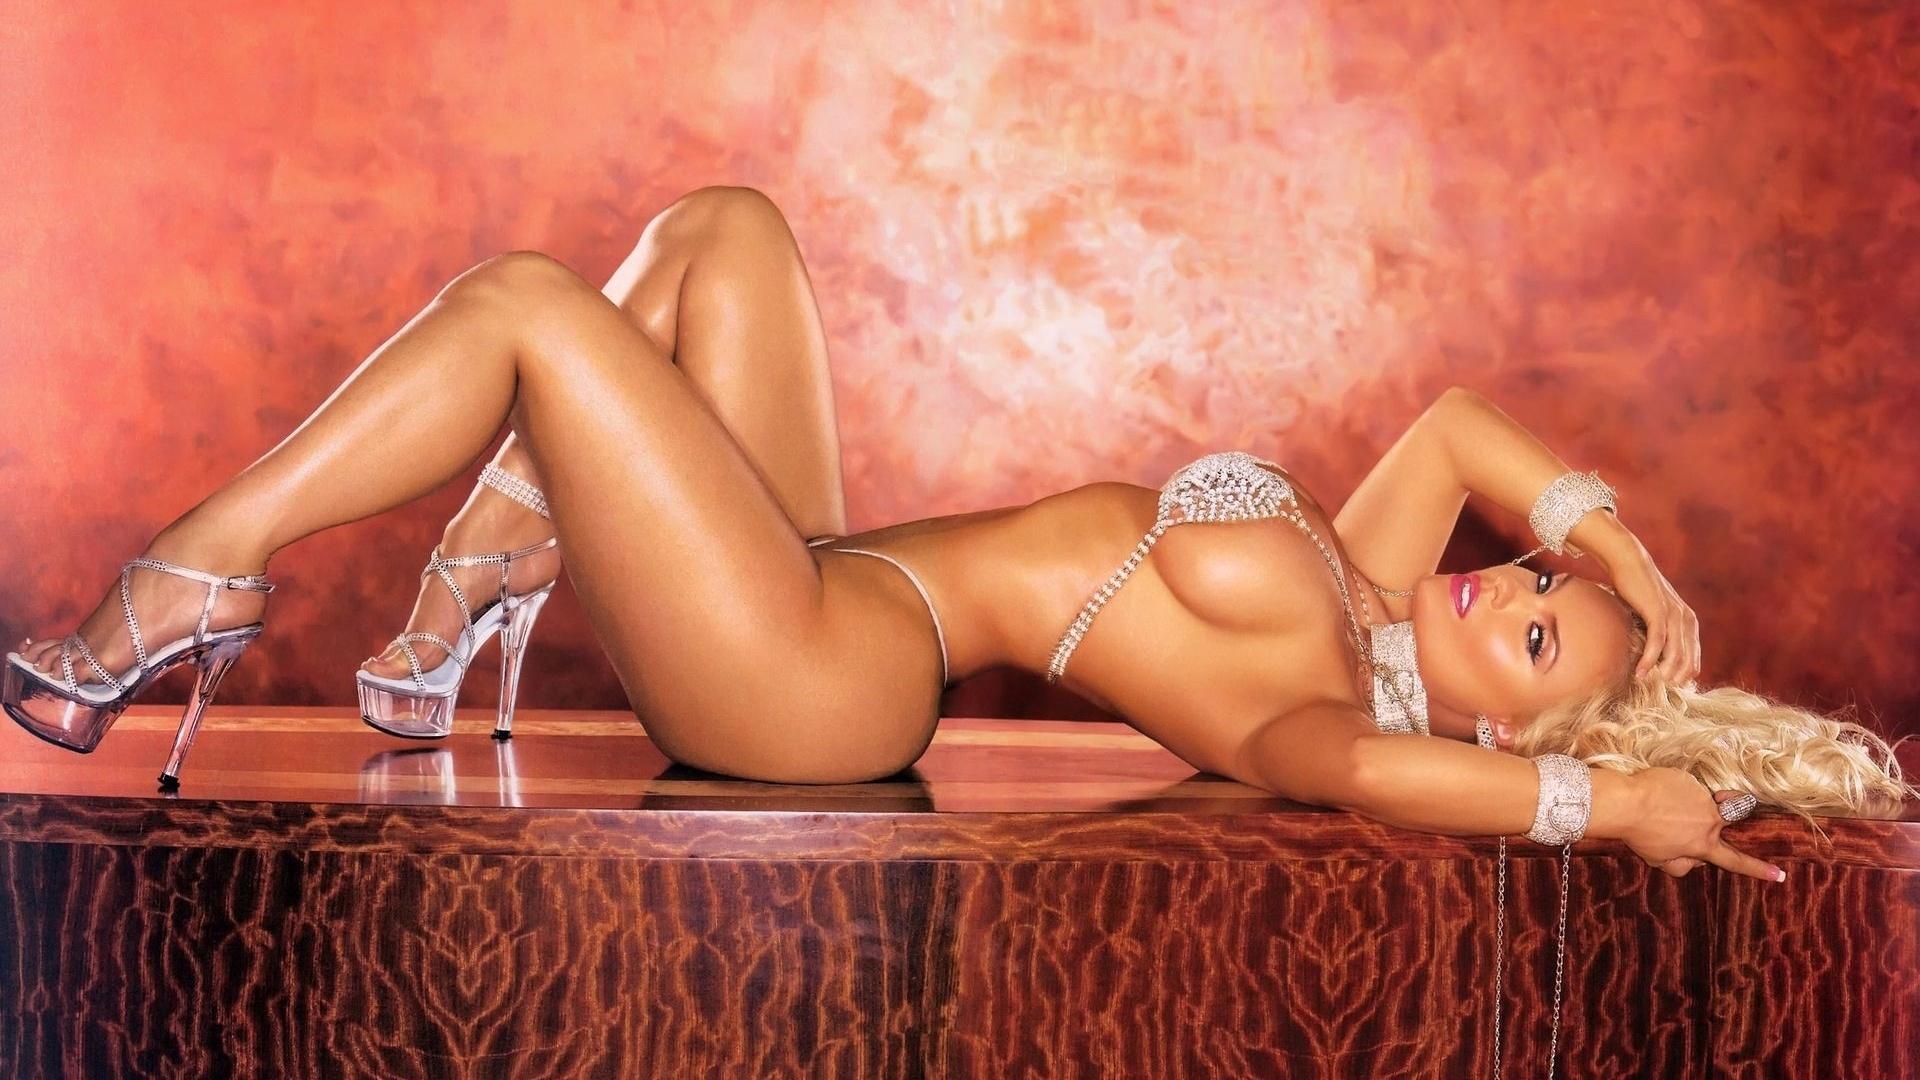 Секс фото - Горячие секс и порно фото на Eroticen.com